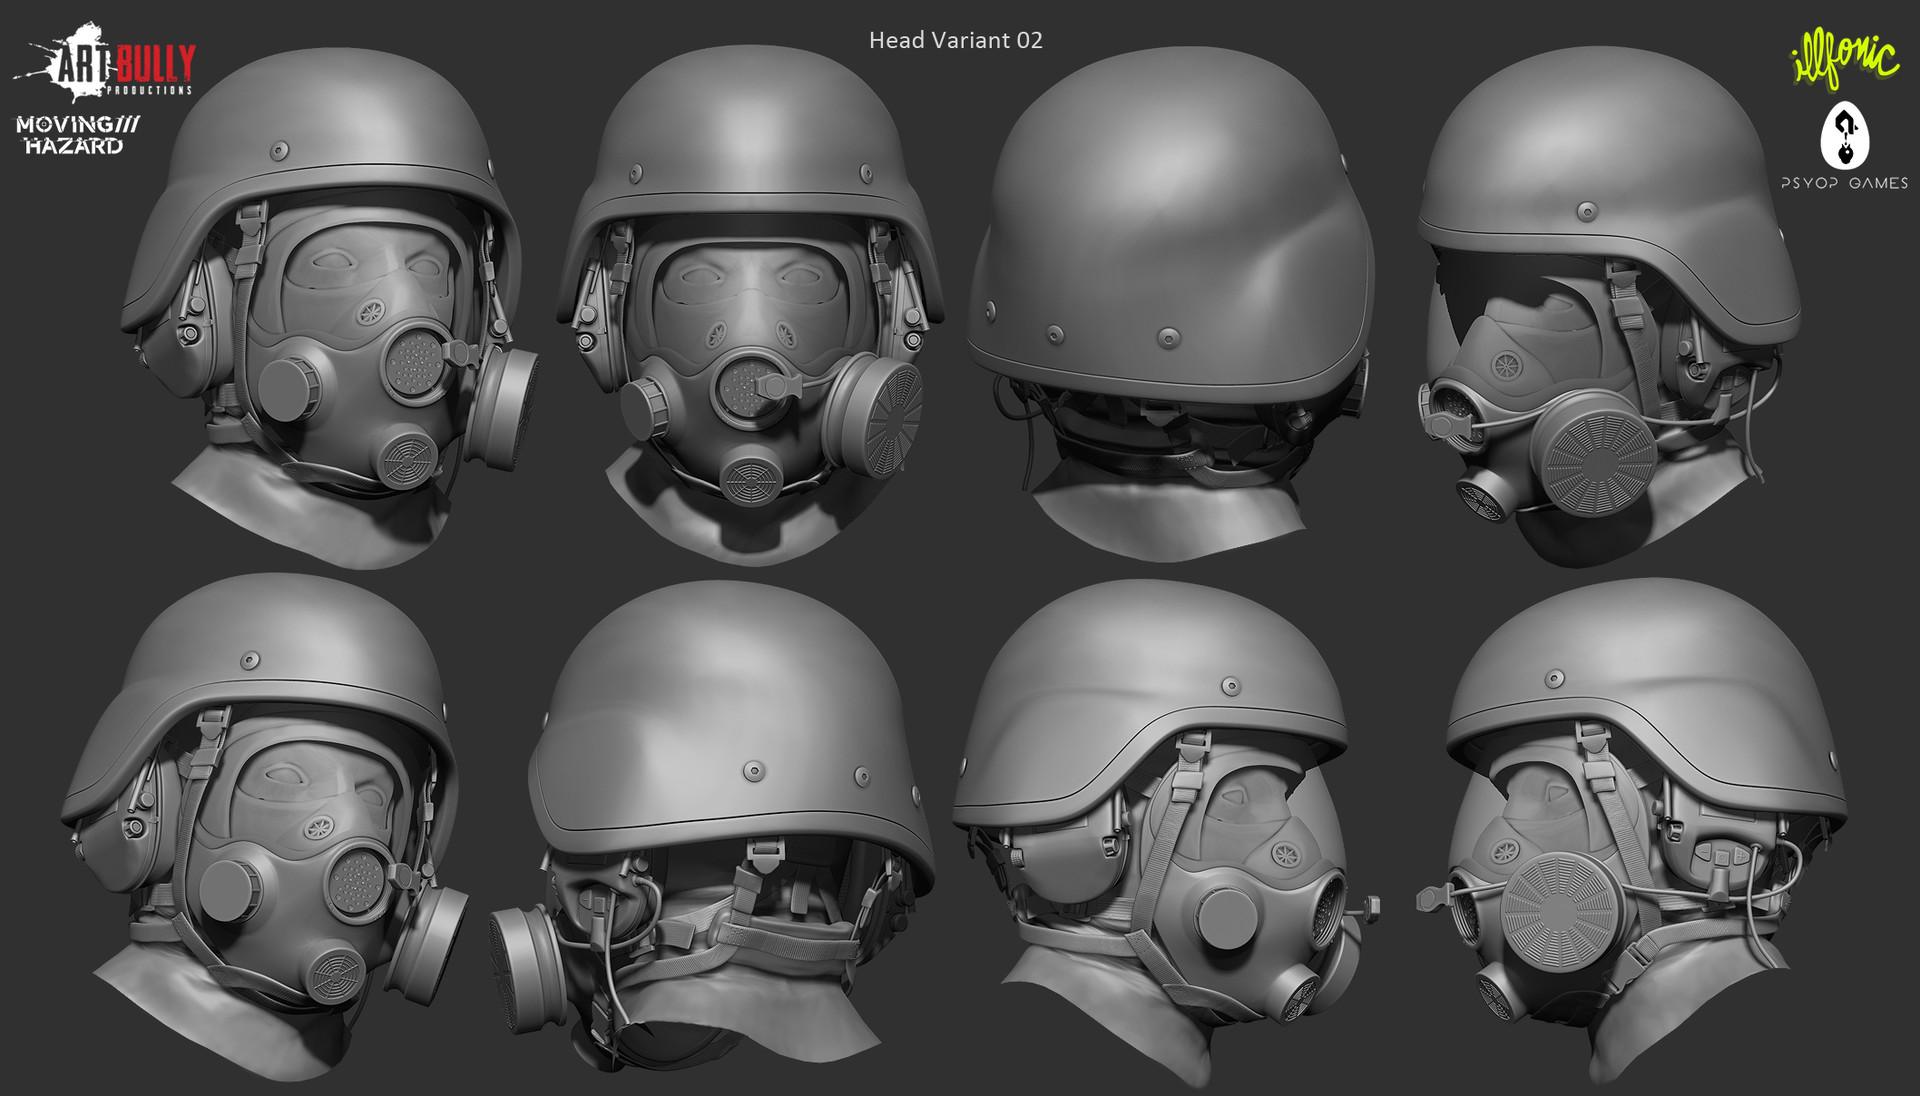 Chx emond hex variant 02 sculpt render 01